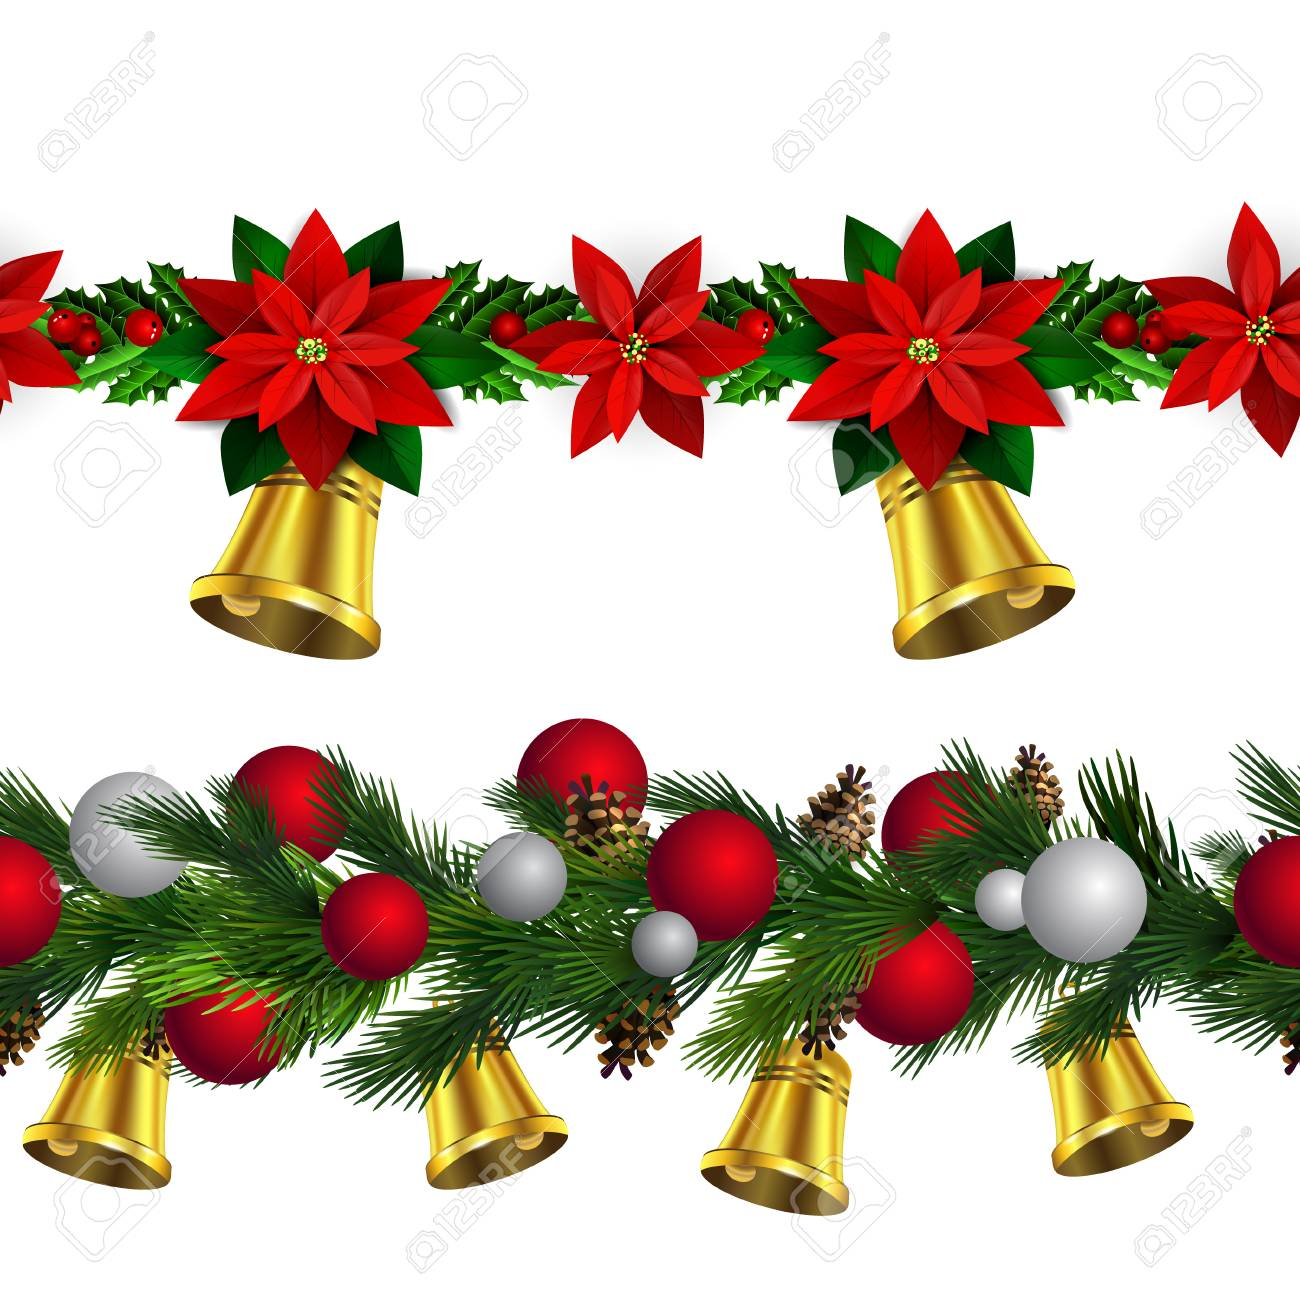 Christmas Border Design.Christmas Border Decoration Design